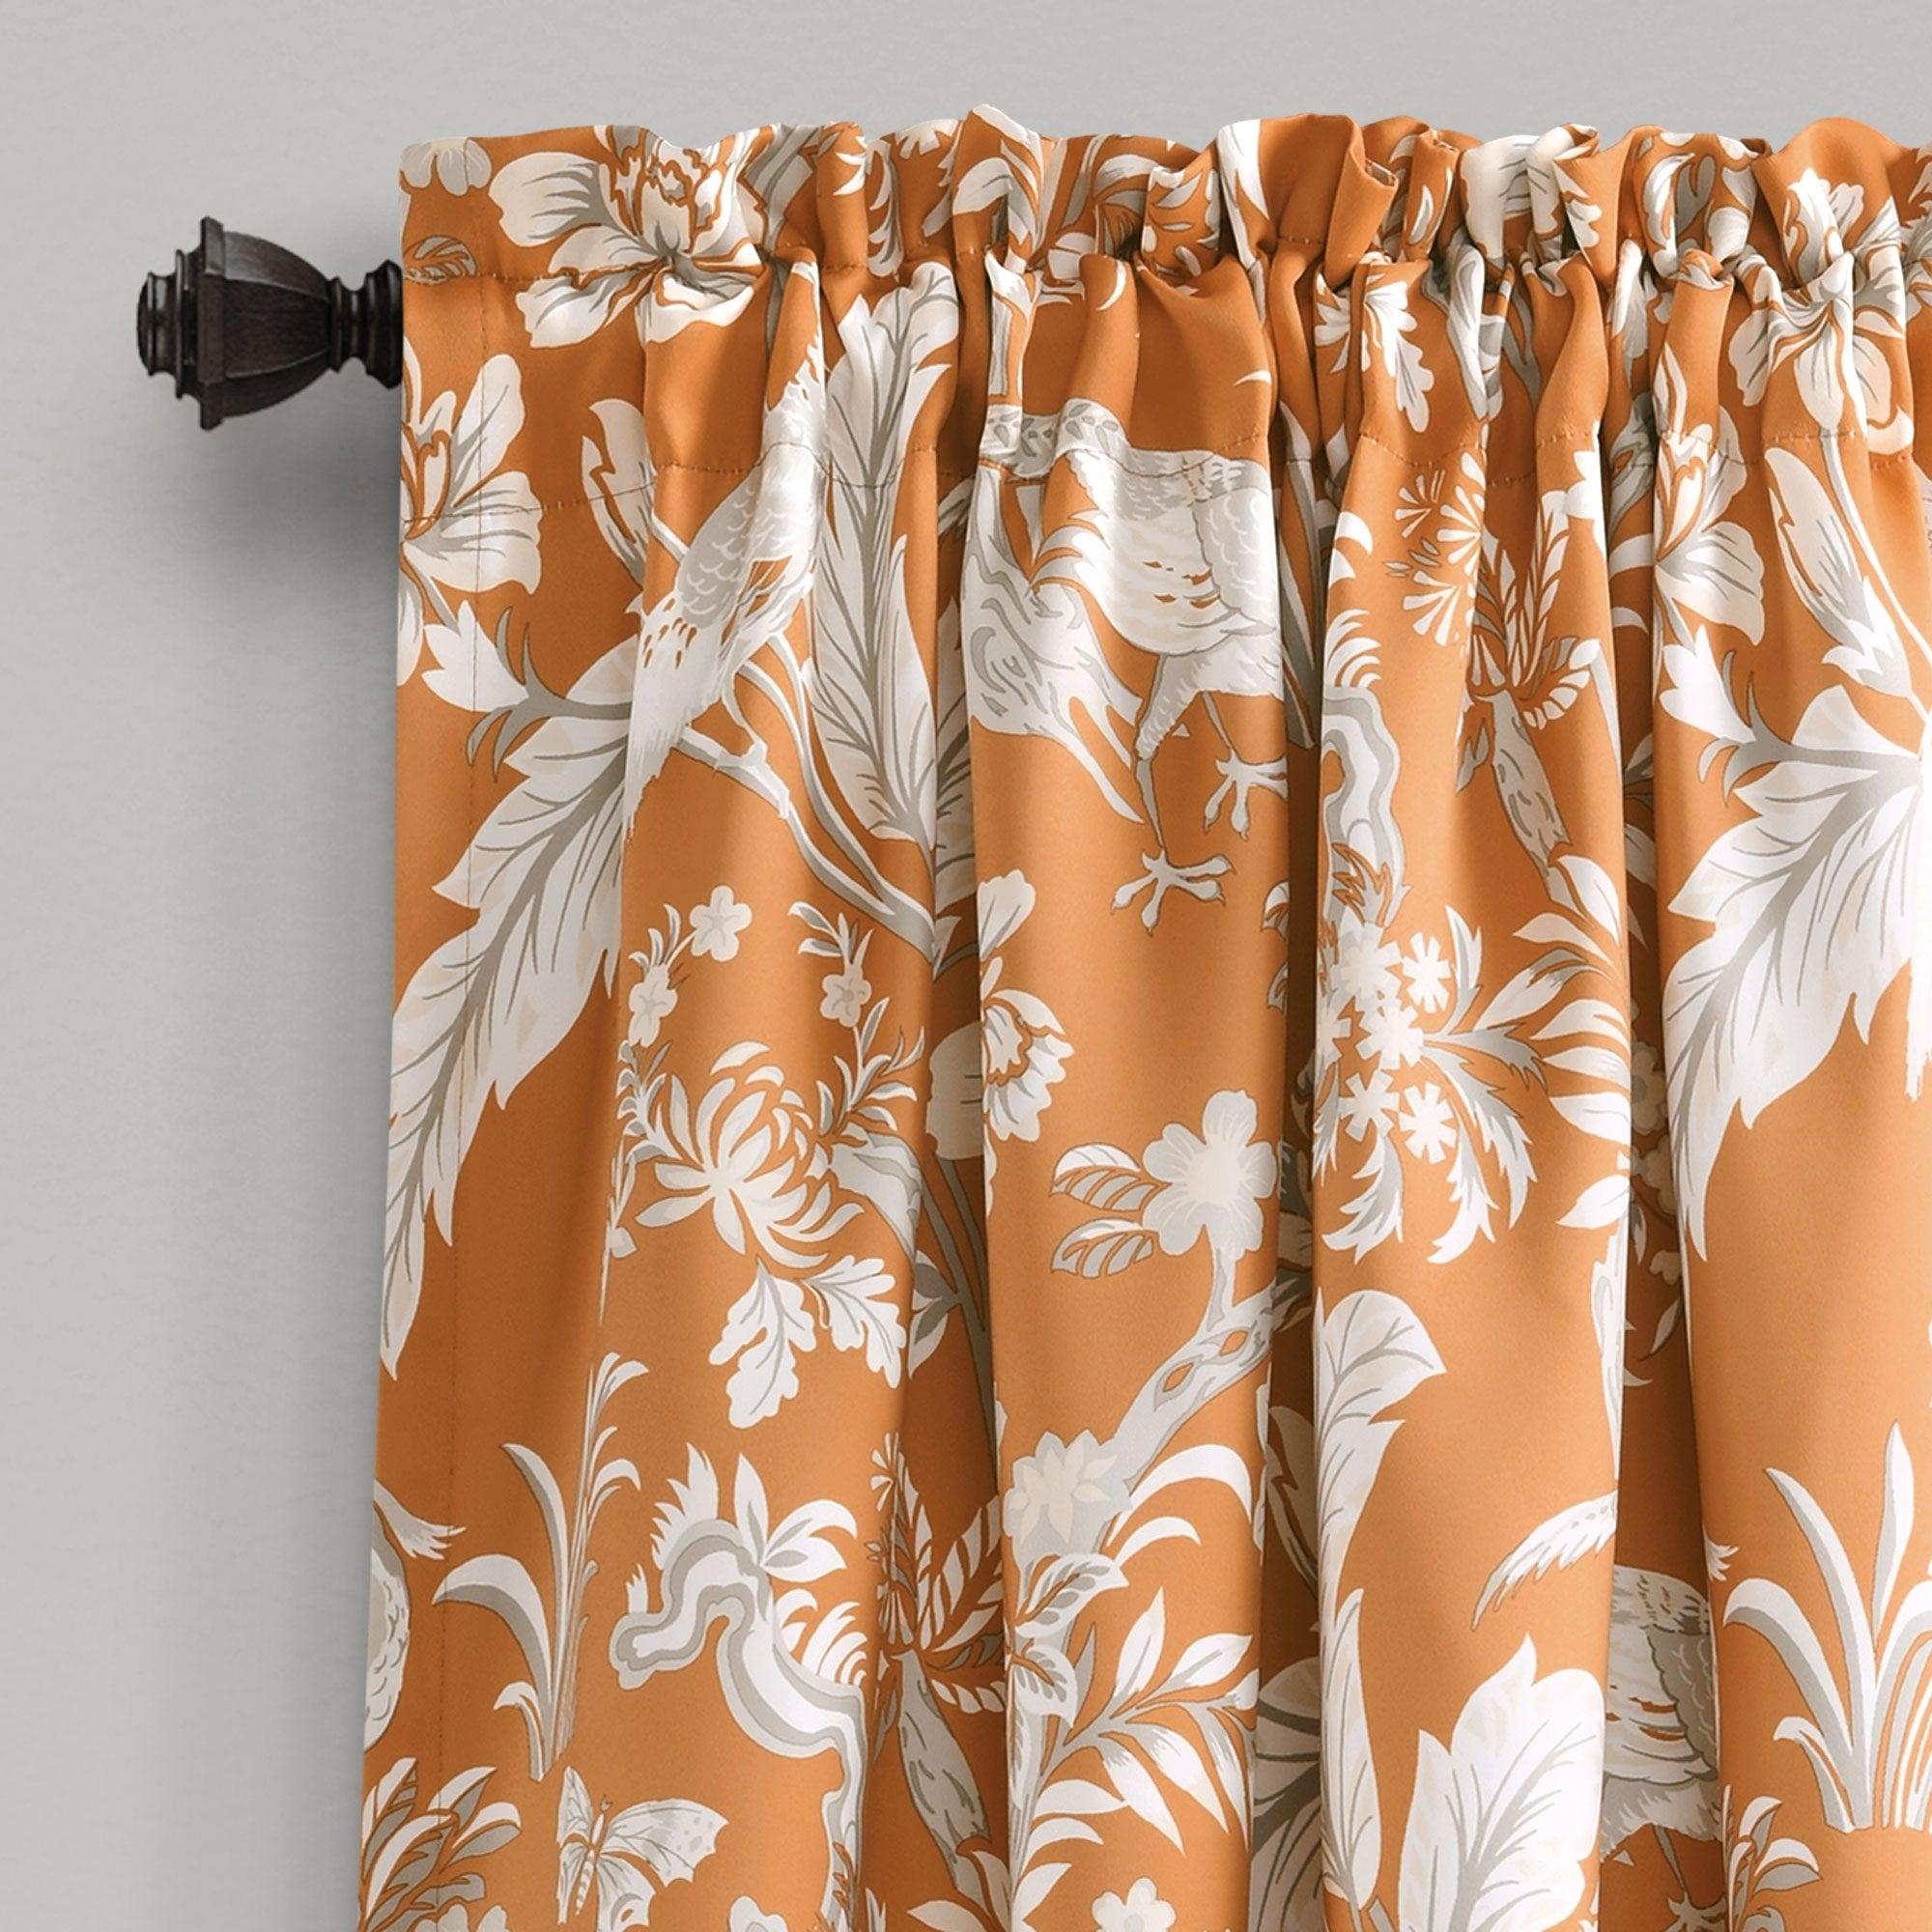 Lush Decor Dolores Room Darkening Floral Curtain Panel Pair Intended For Dolores Room Darkening Floral Curtain Panel Pairs (View 5 of 20)